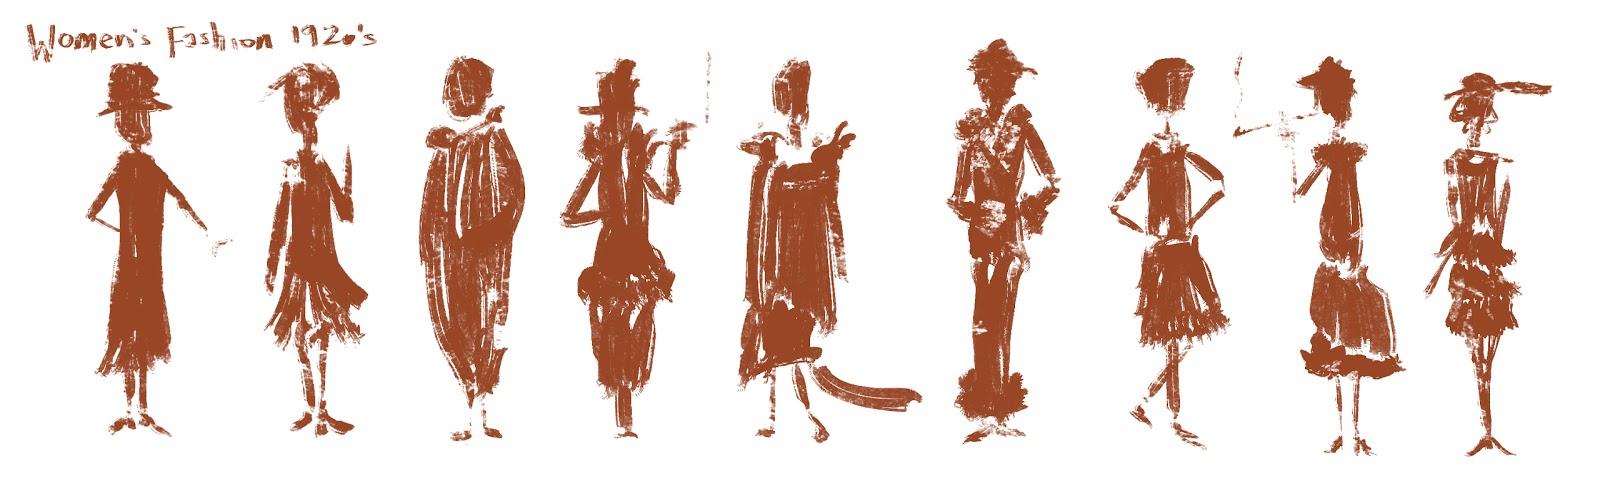 Sharackula 1920 s women s fashion silhouettes